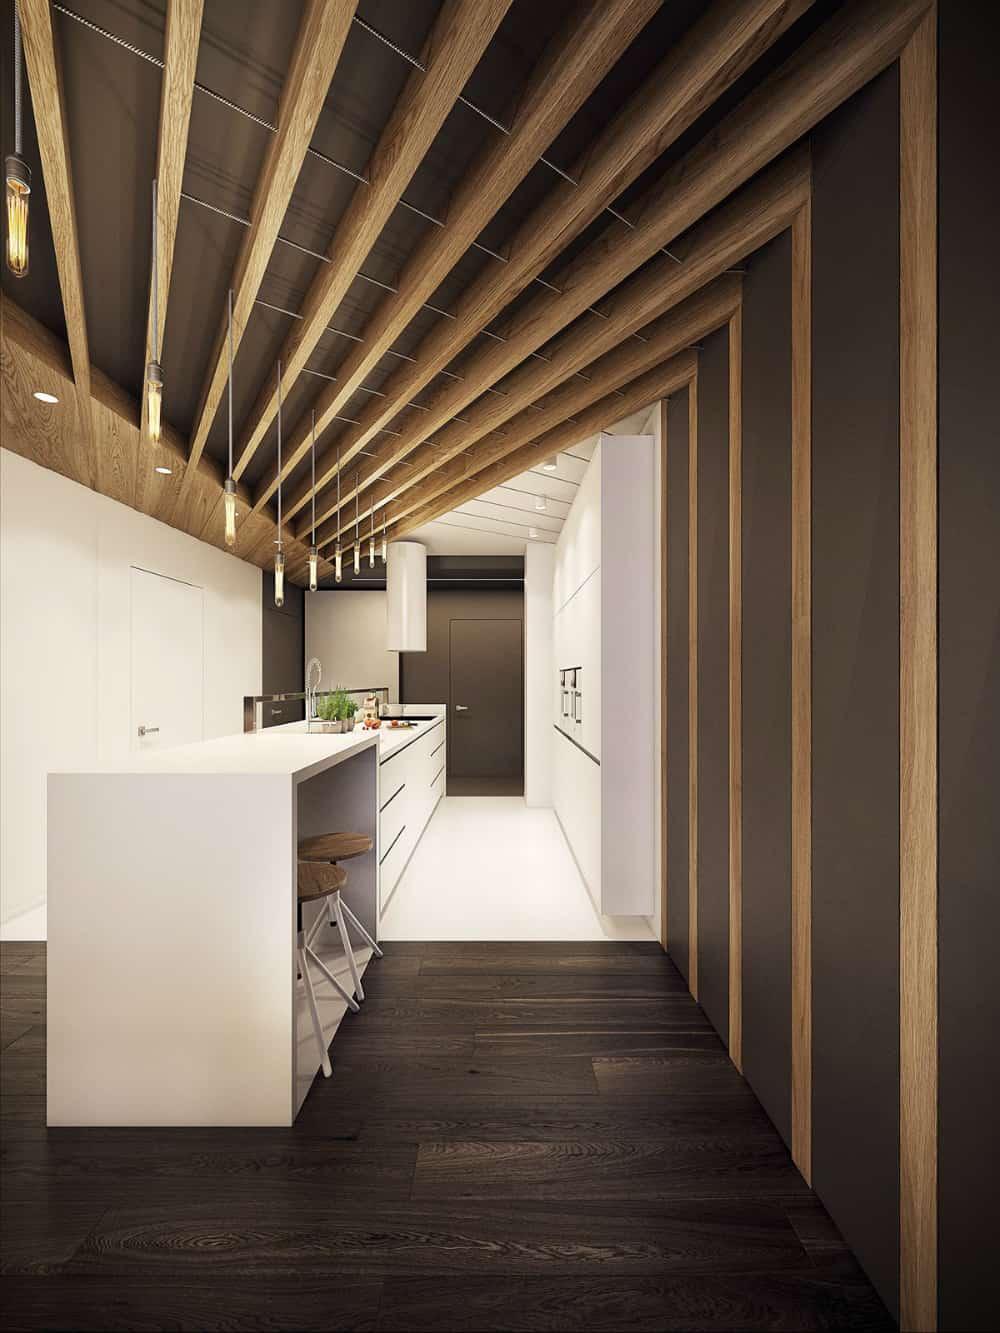 Unique ceiling design by PLASTERLINA